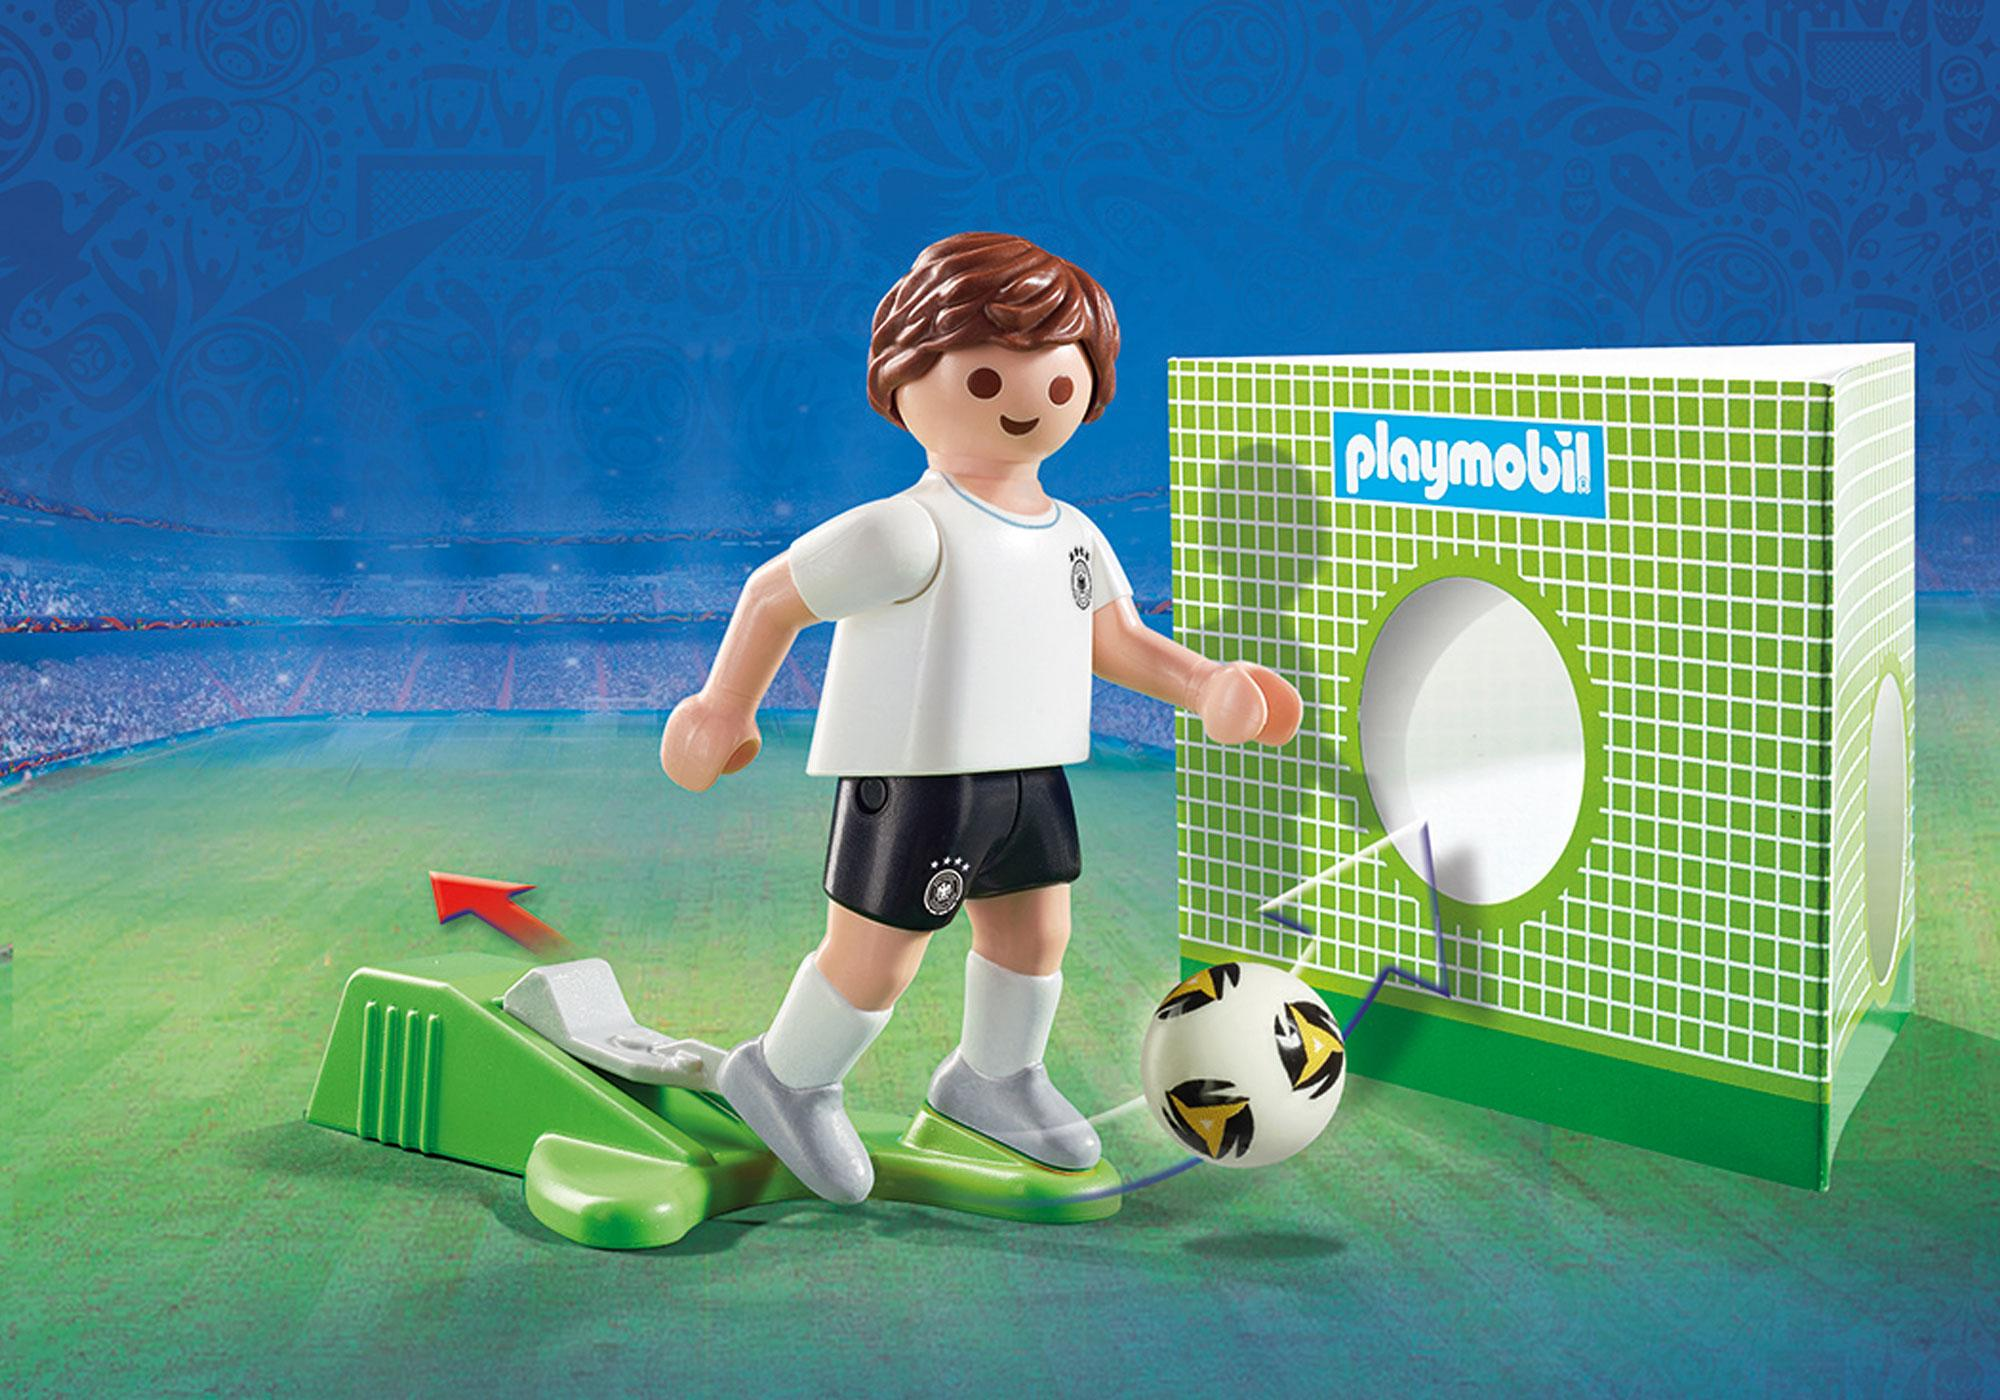 http://media.playmobil.com/i/playmobil/9511_product_detail/Jugador de Fútbol - Alemania